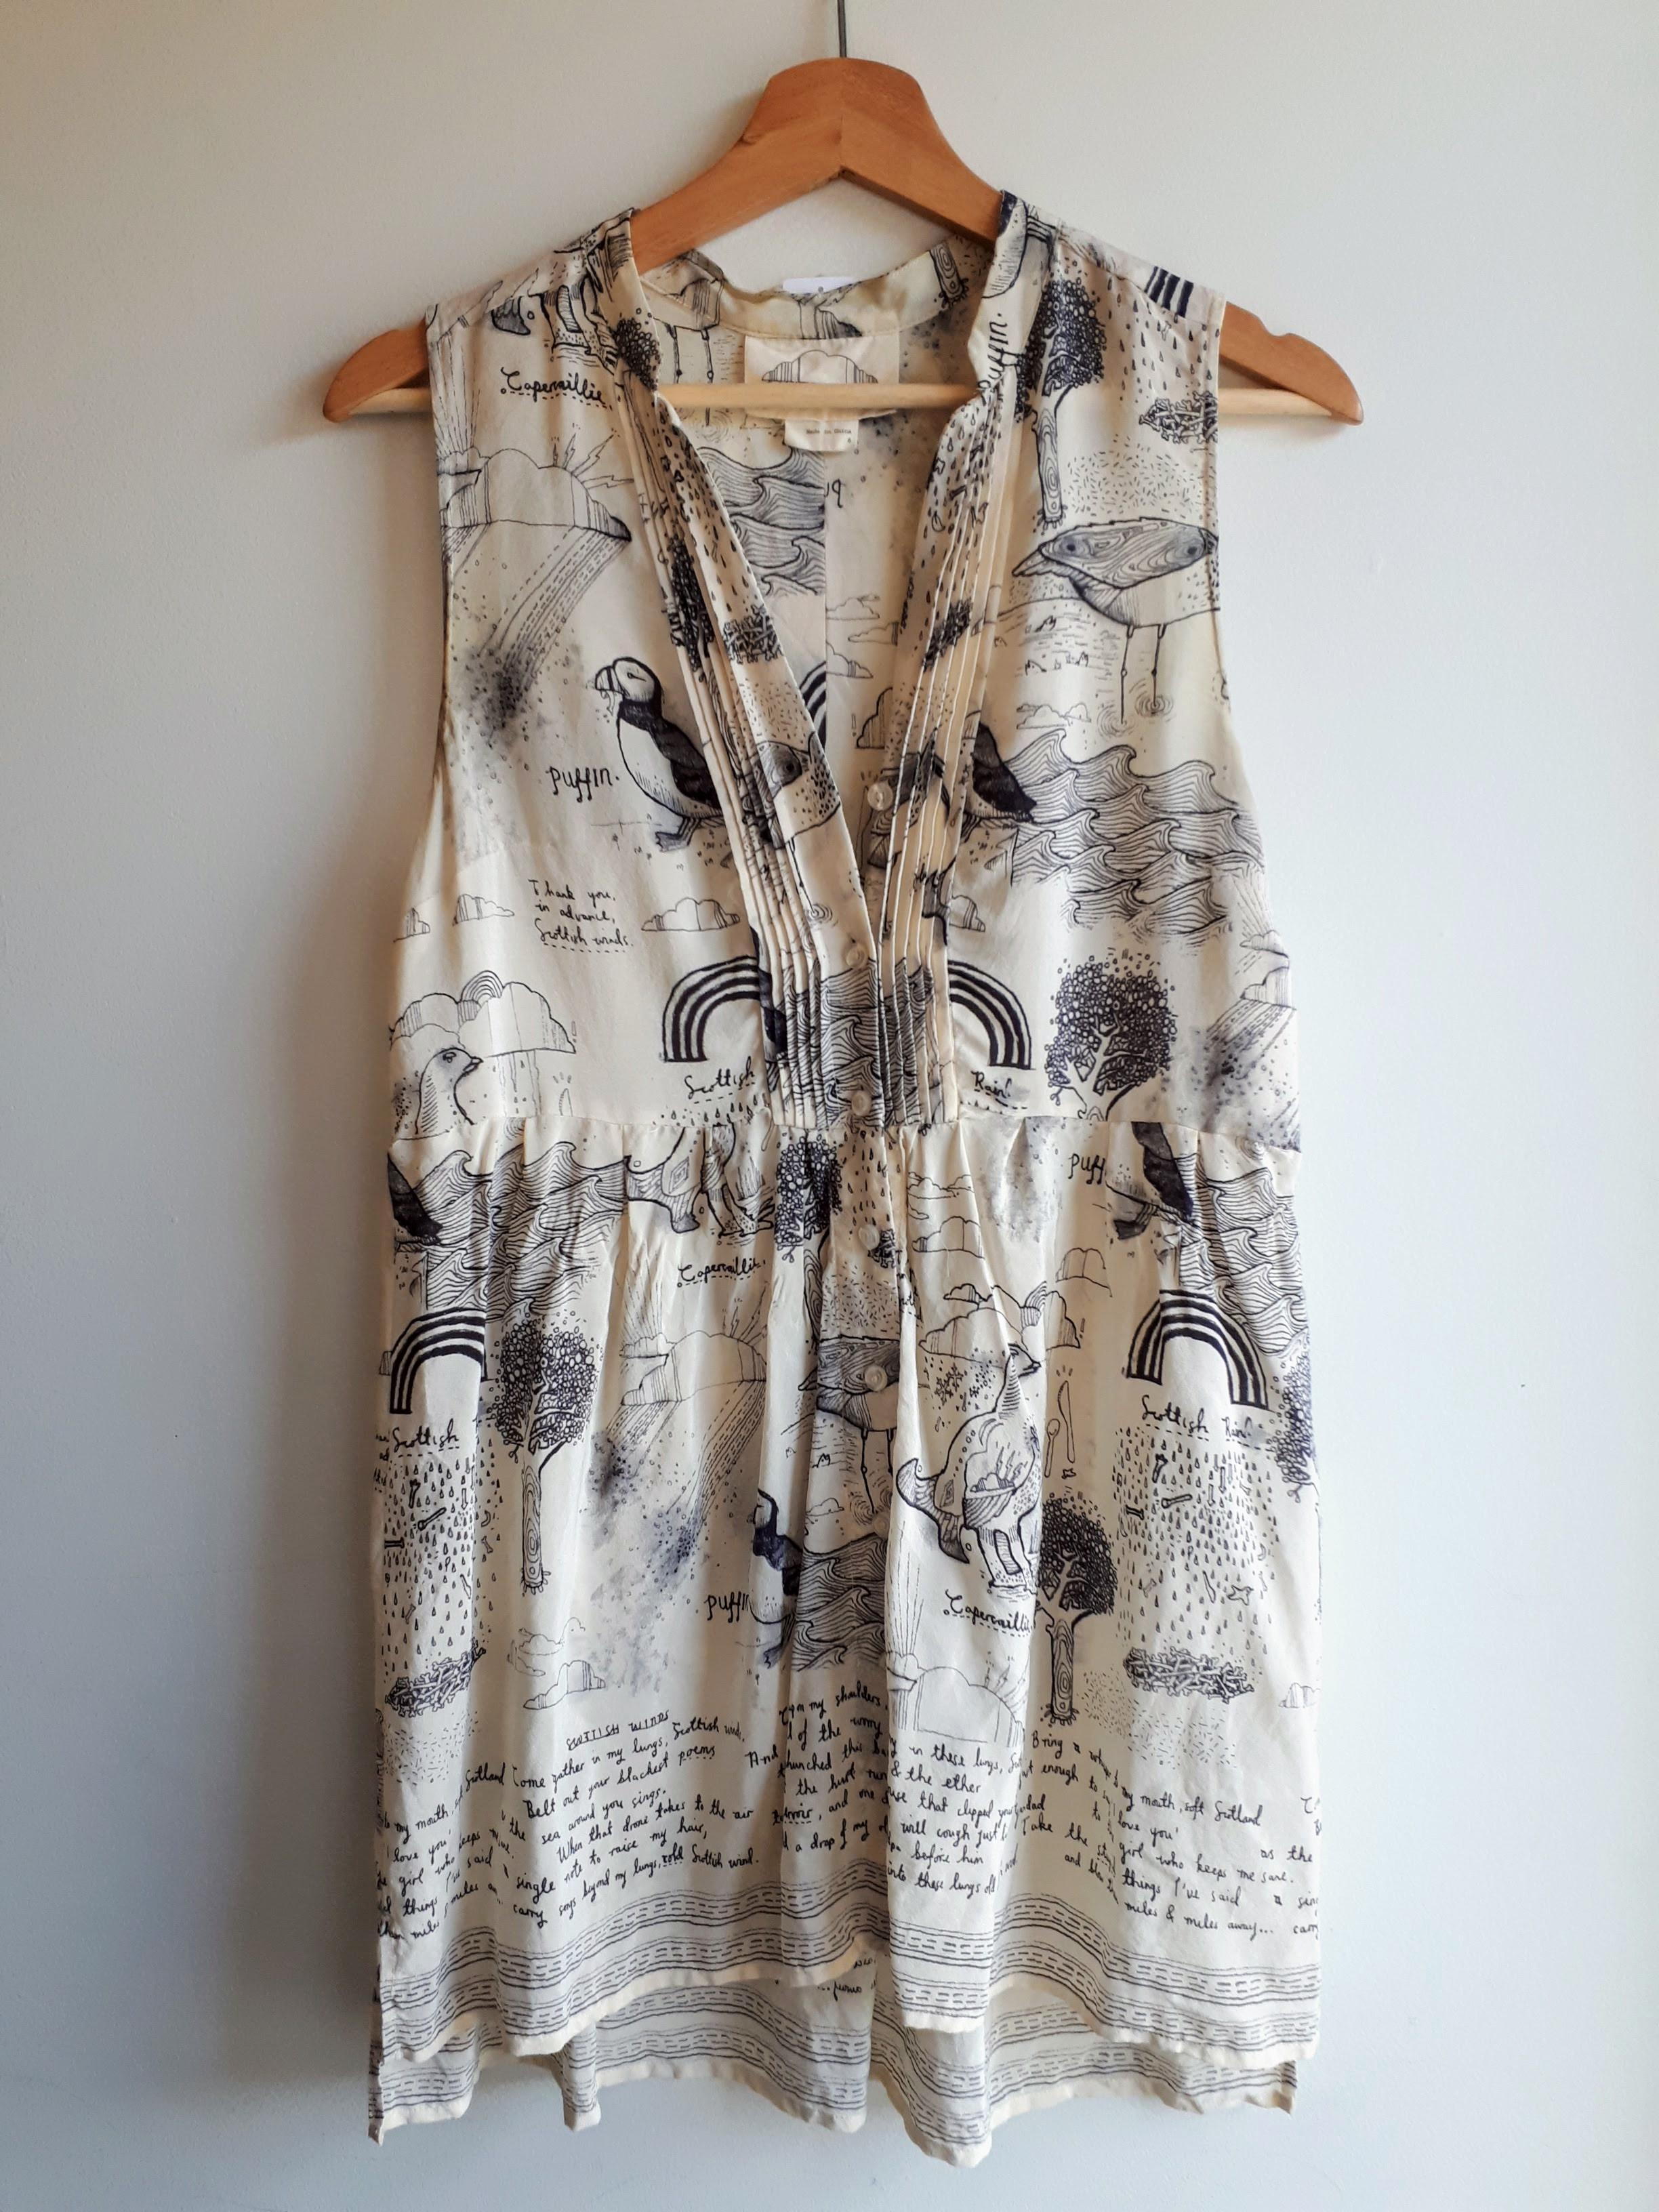 Puffin dress; Size 6, $32